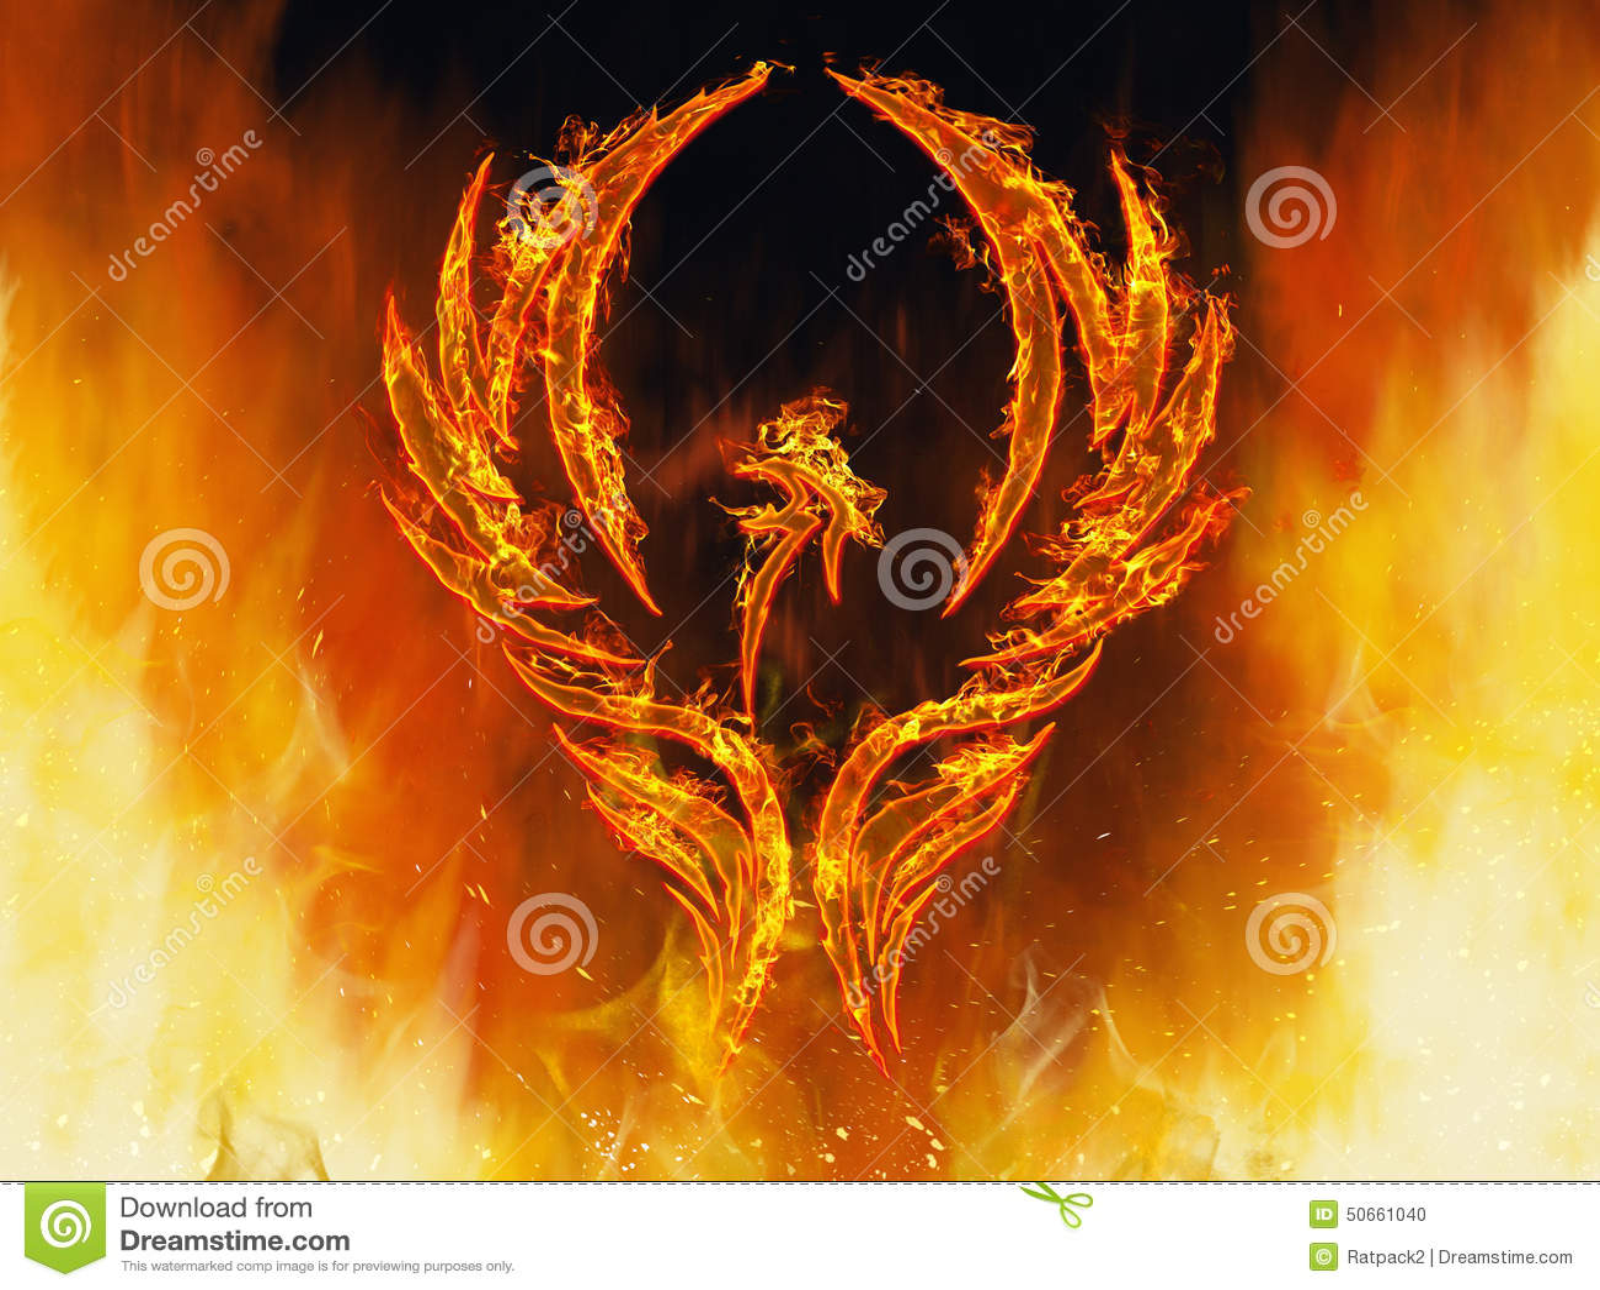 Phoenix Rising Stock Photo Image 50661040